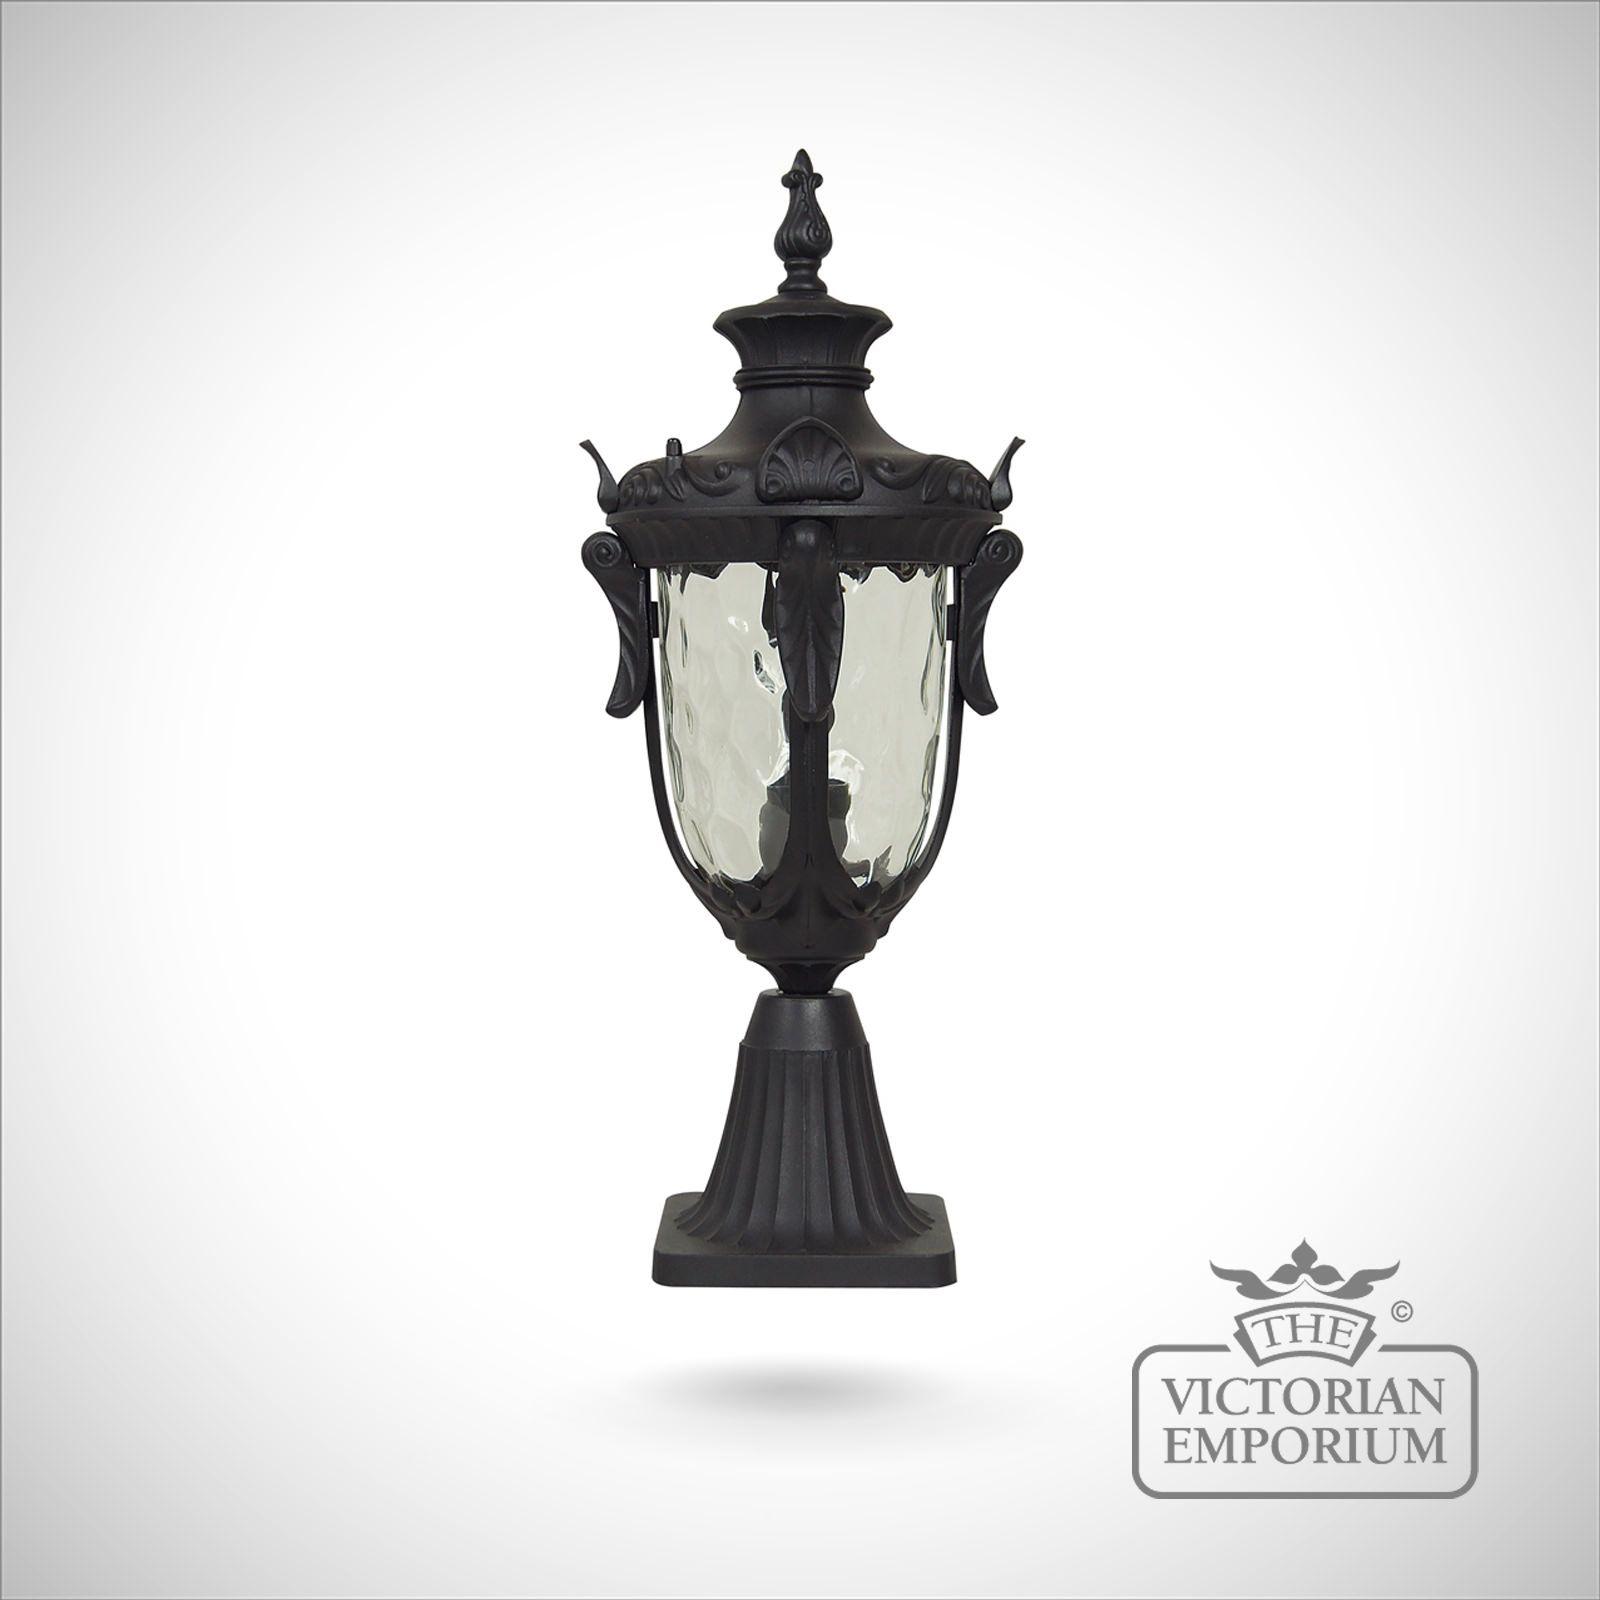 Bedfords Medium Pedestal Lantern In Black: Philadelphia Medium Pedestal Lantern In Black